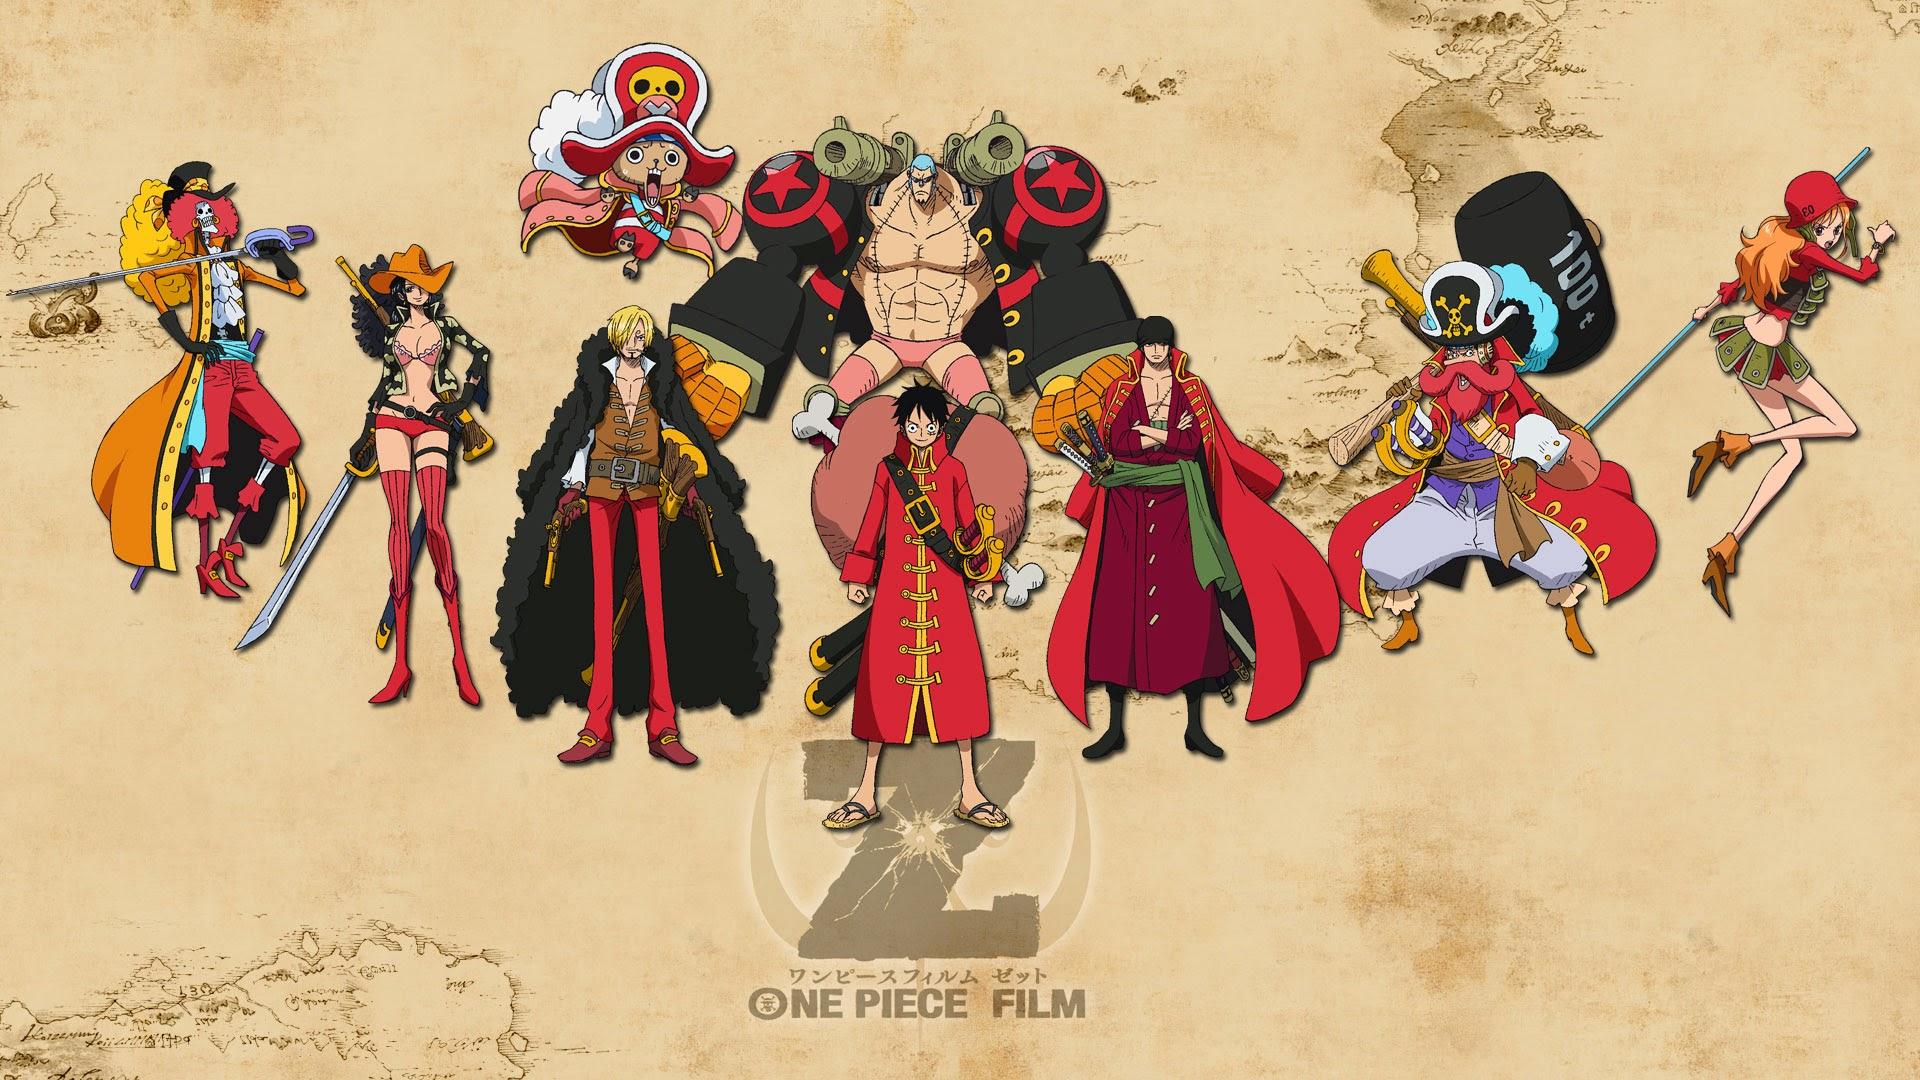 straw hats mugiwara pirates one piece film z costume anime hd 1920x1080